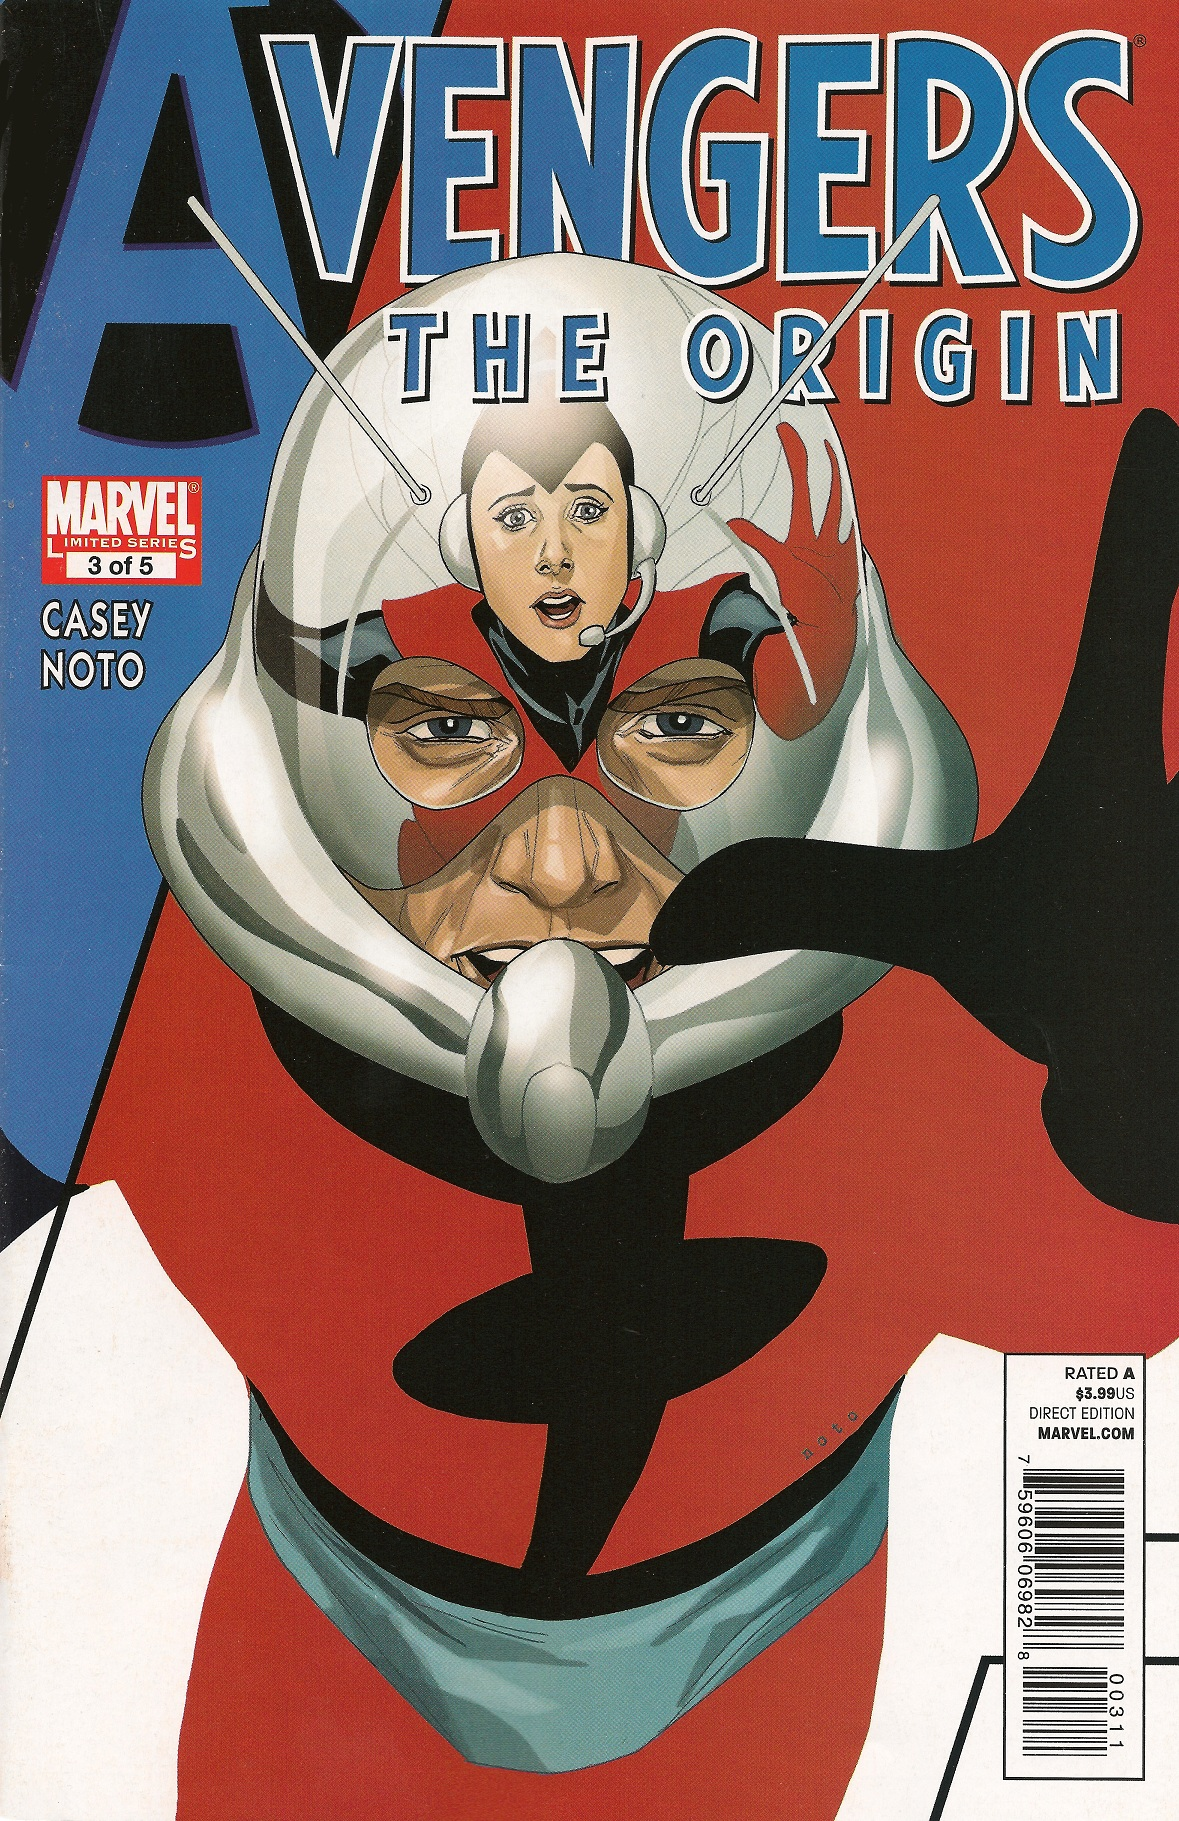 Avengers: The Origin Vol 1 3